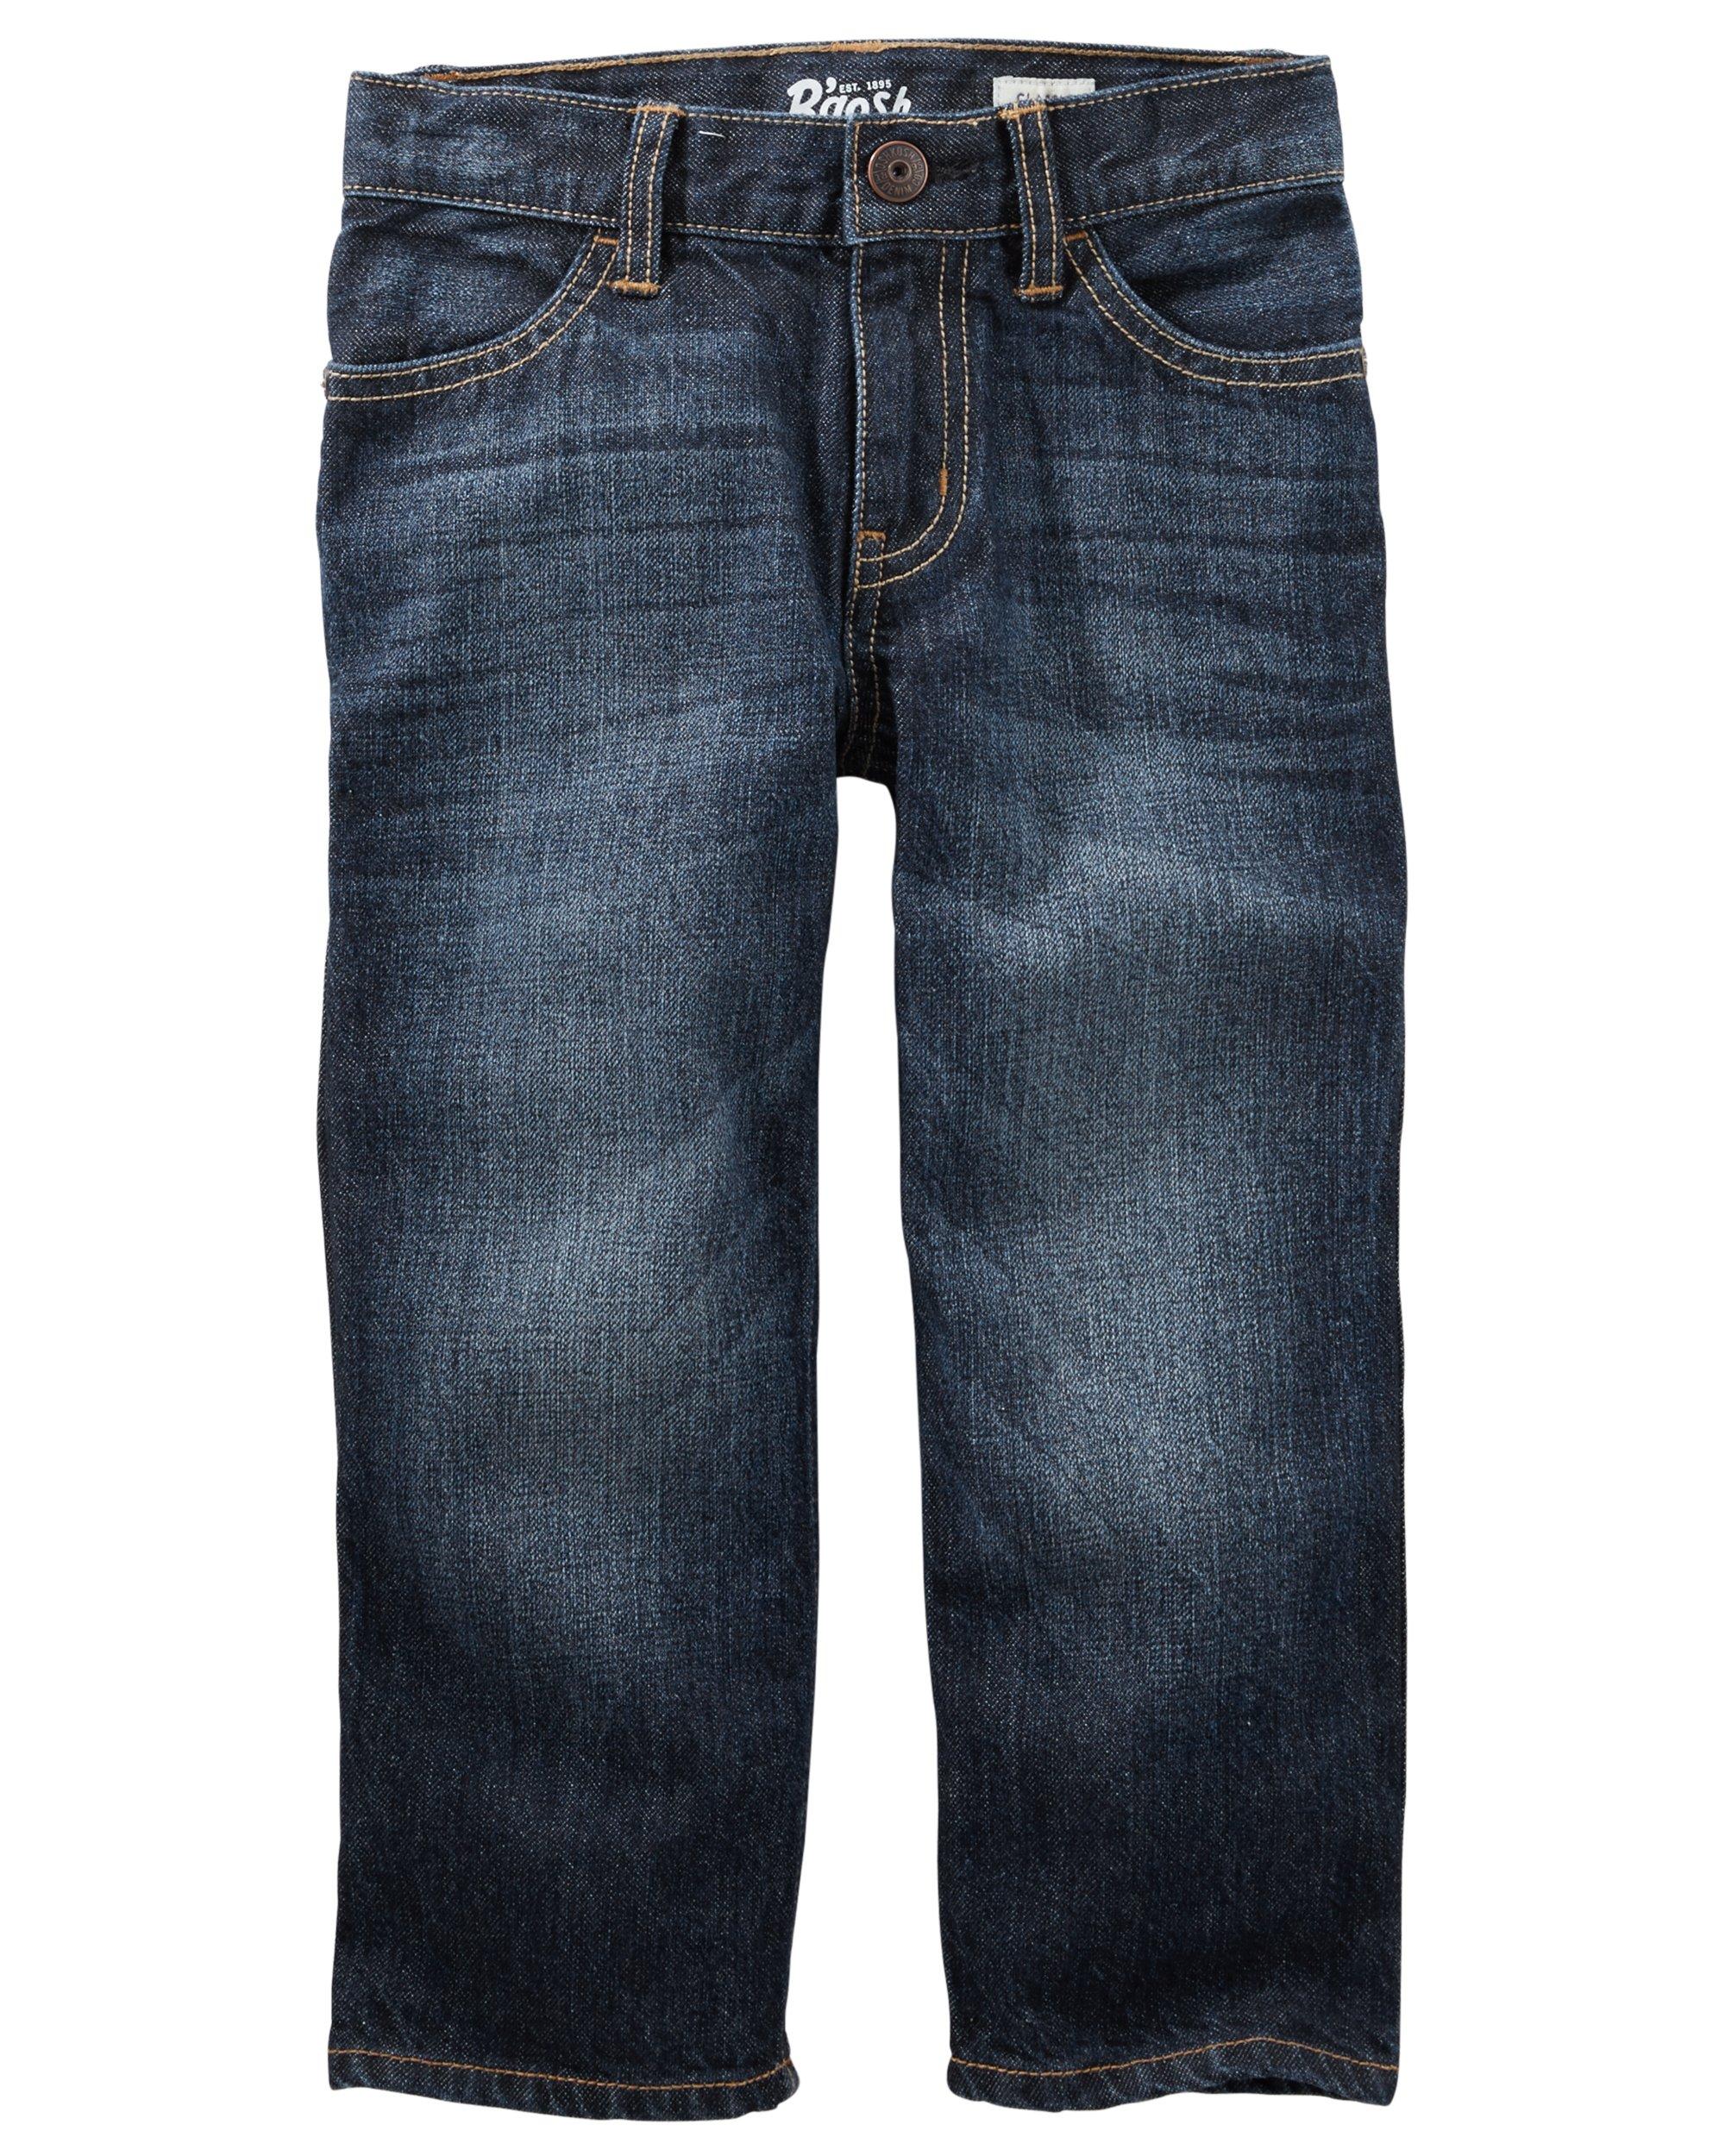 Osh Kosh Boys' Toddler Classic Jeans, True Blue, 3T